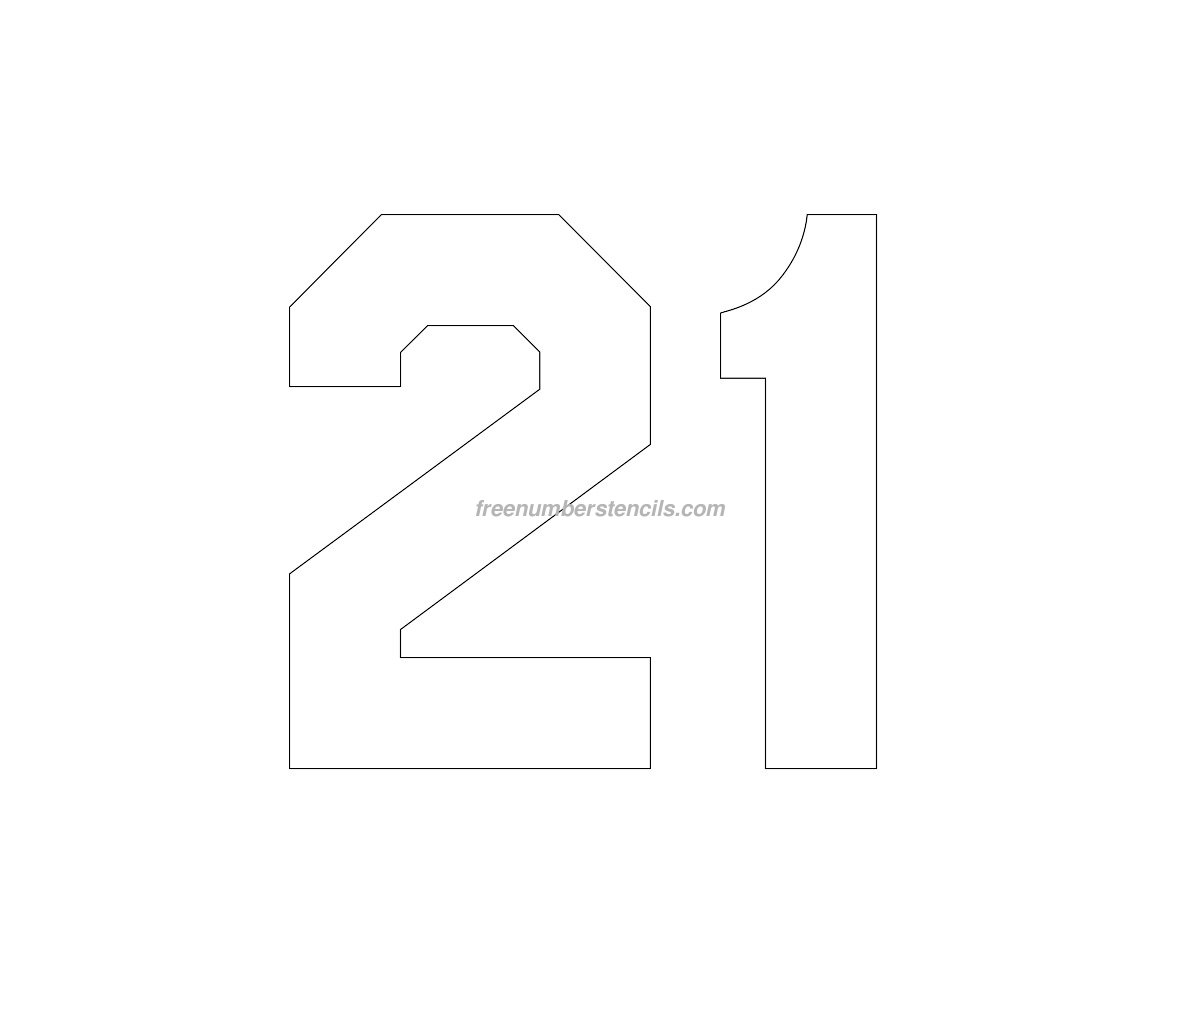 hockey number stencils archives freenumberstencils com